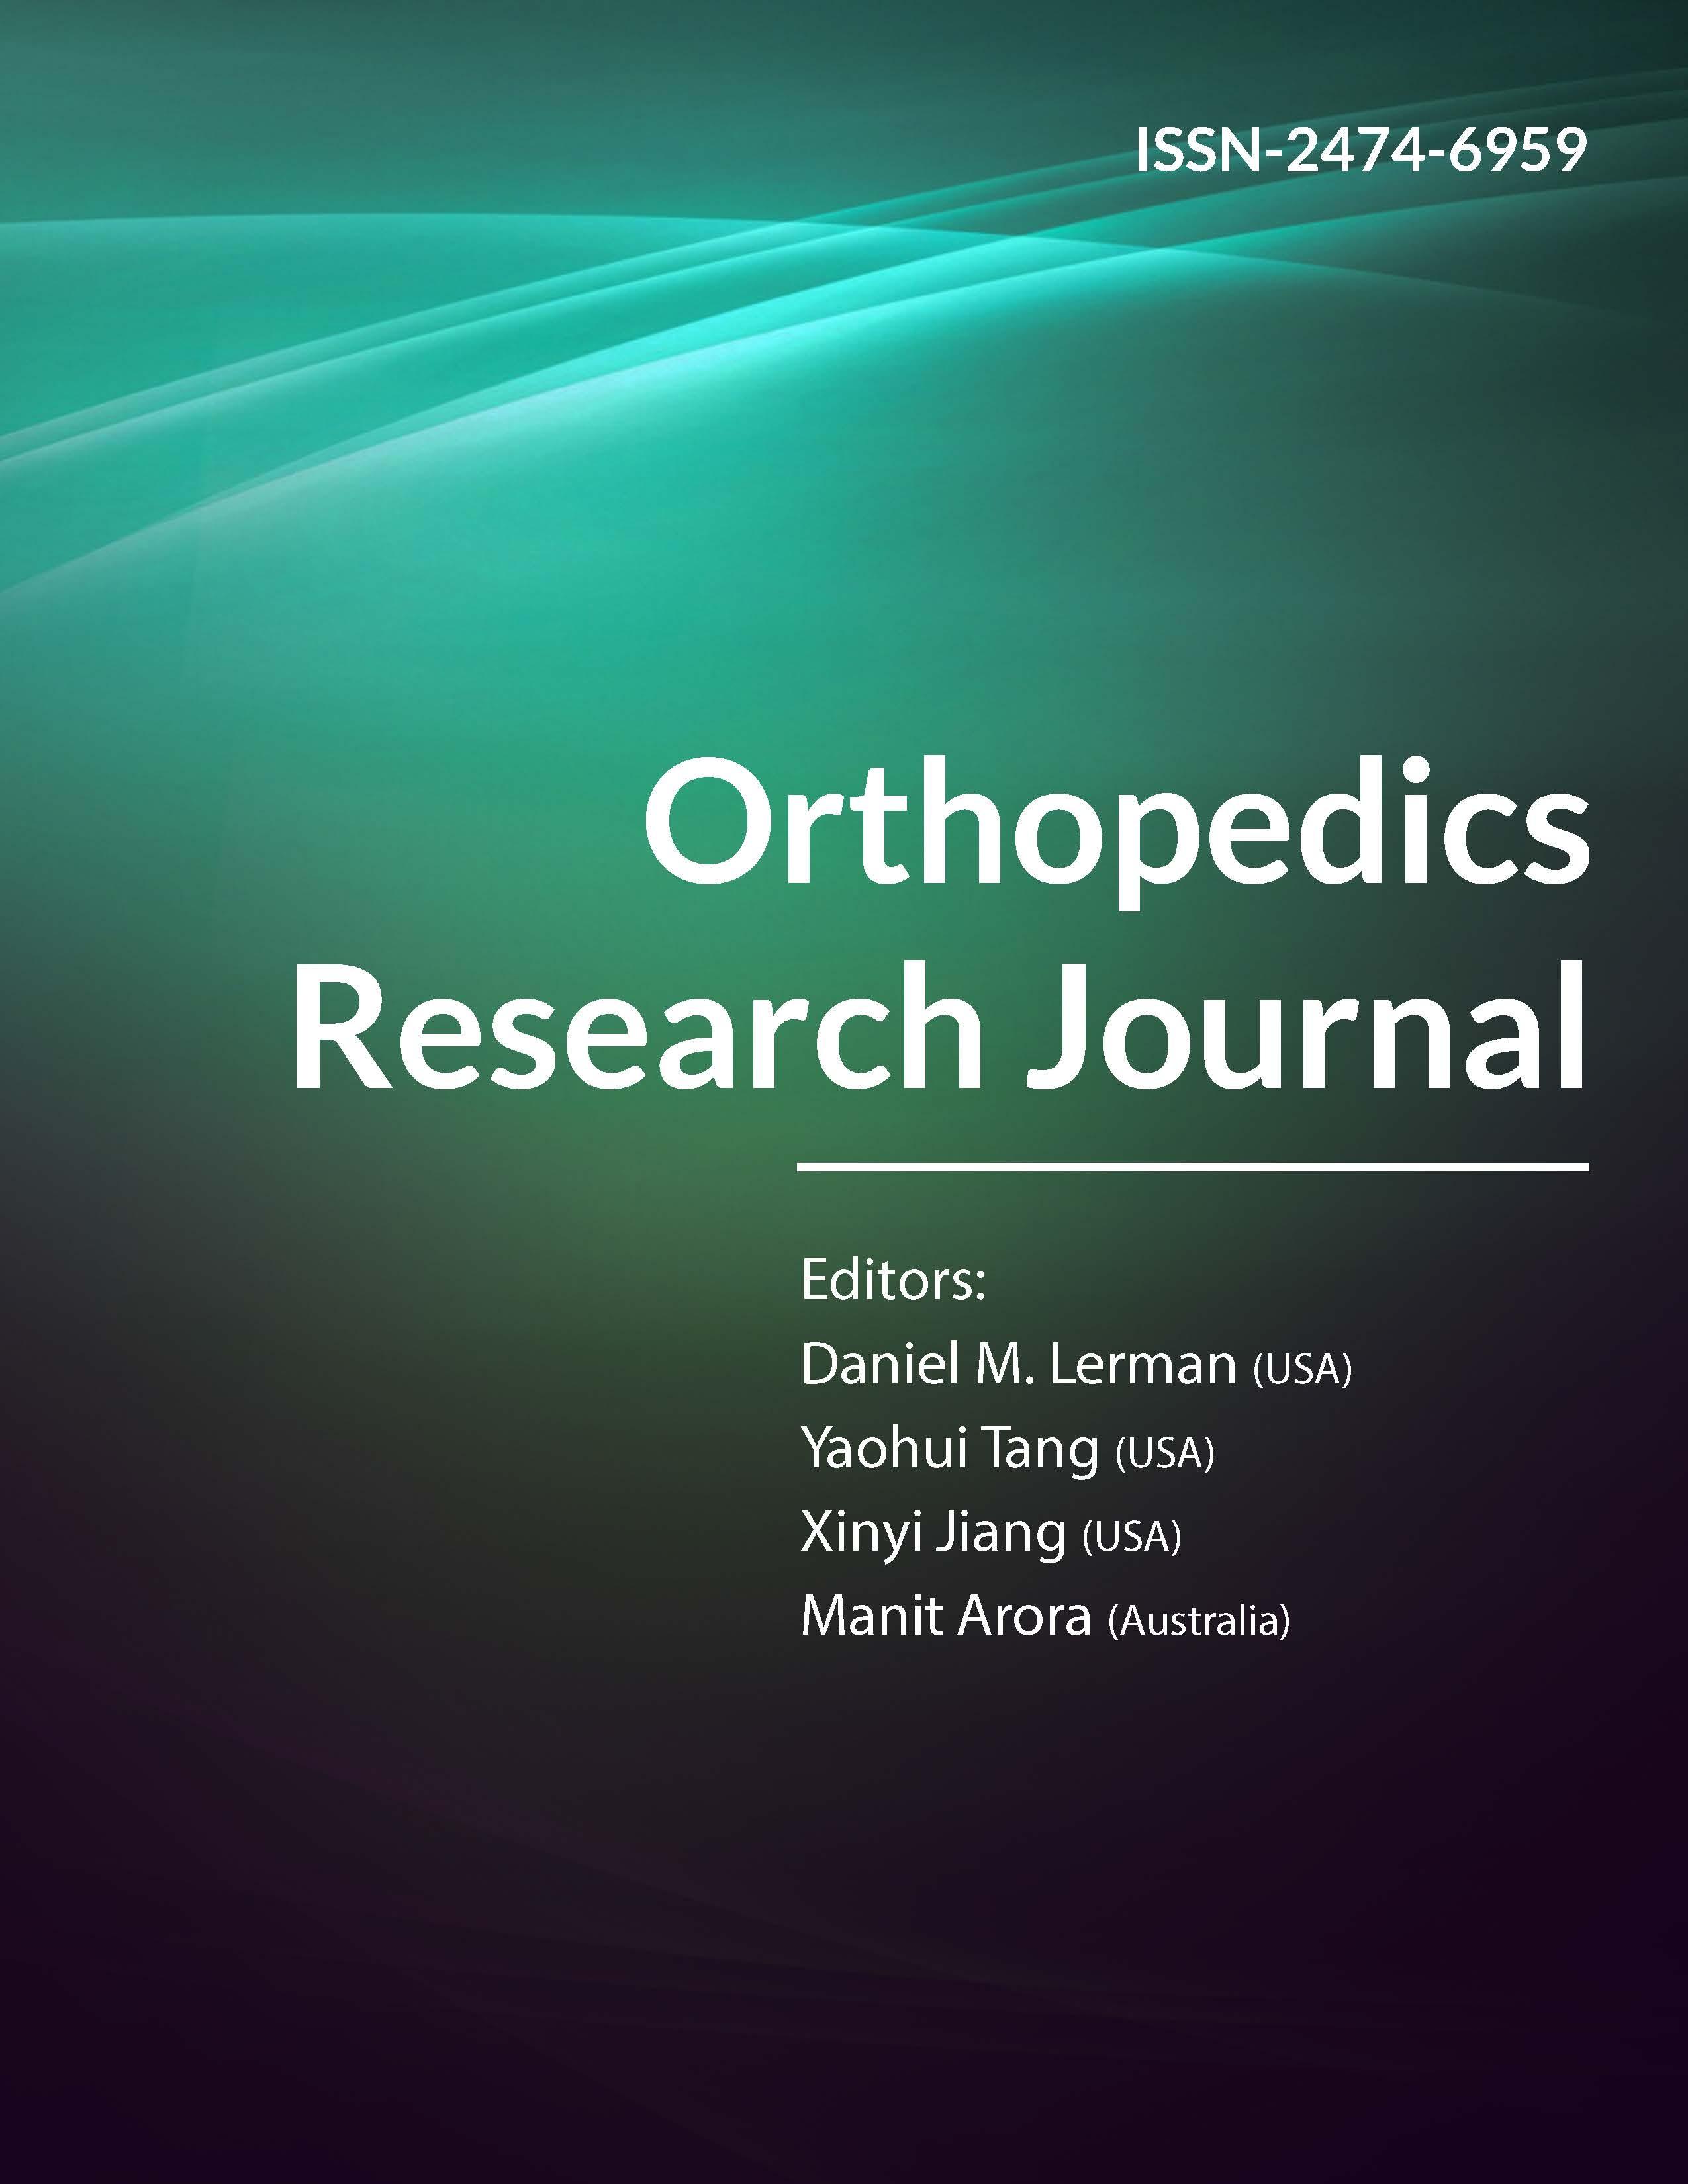 Orthopedics Research Journal